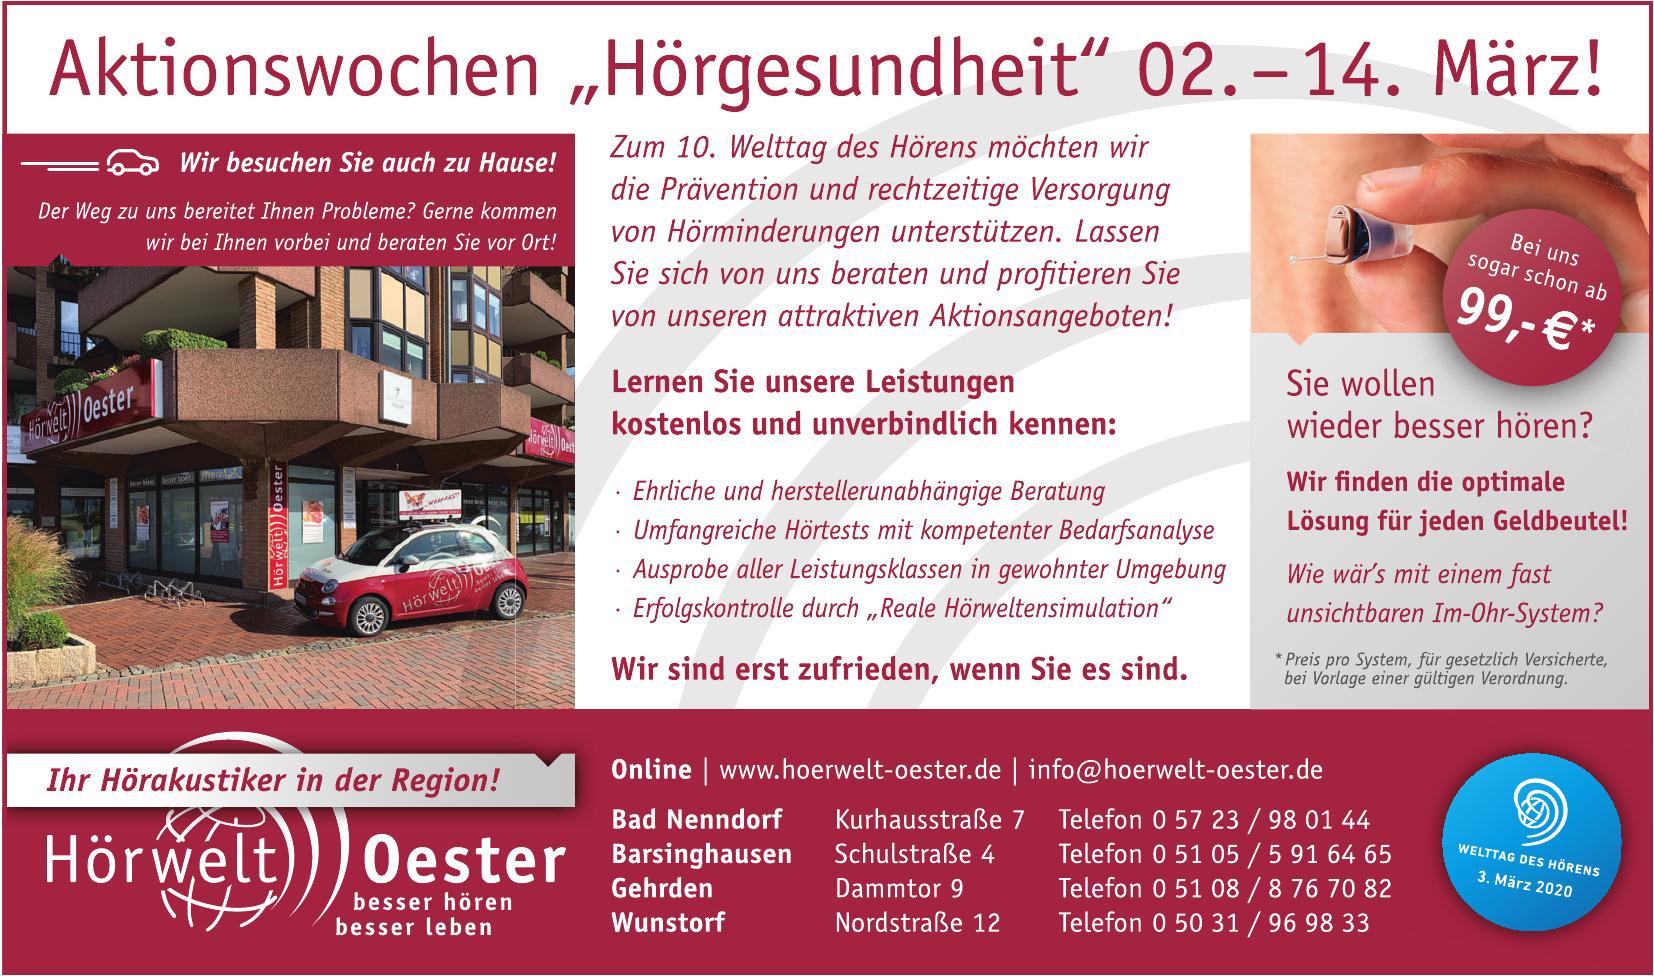 Hörwelt Oester